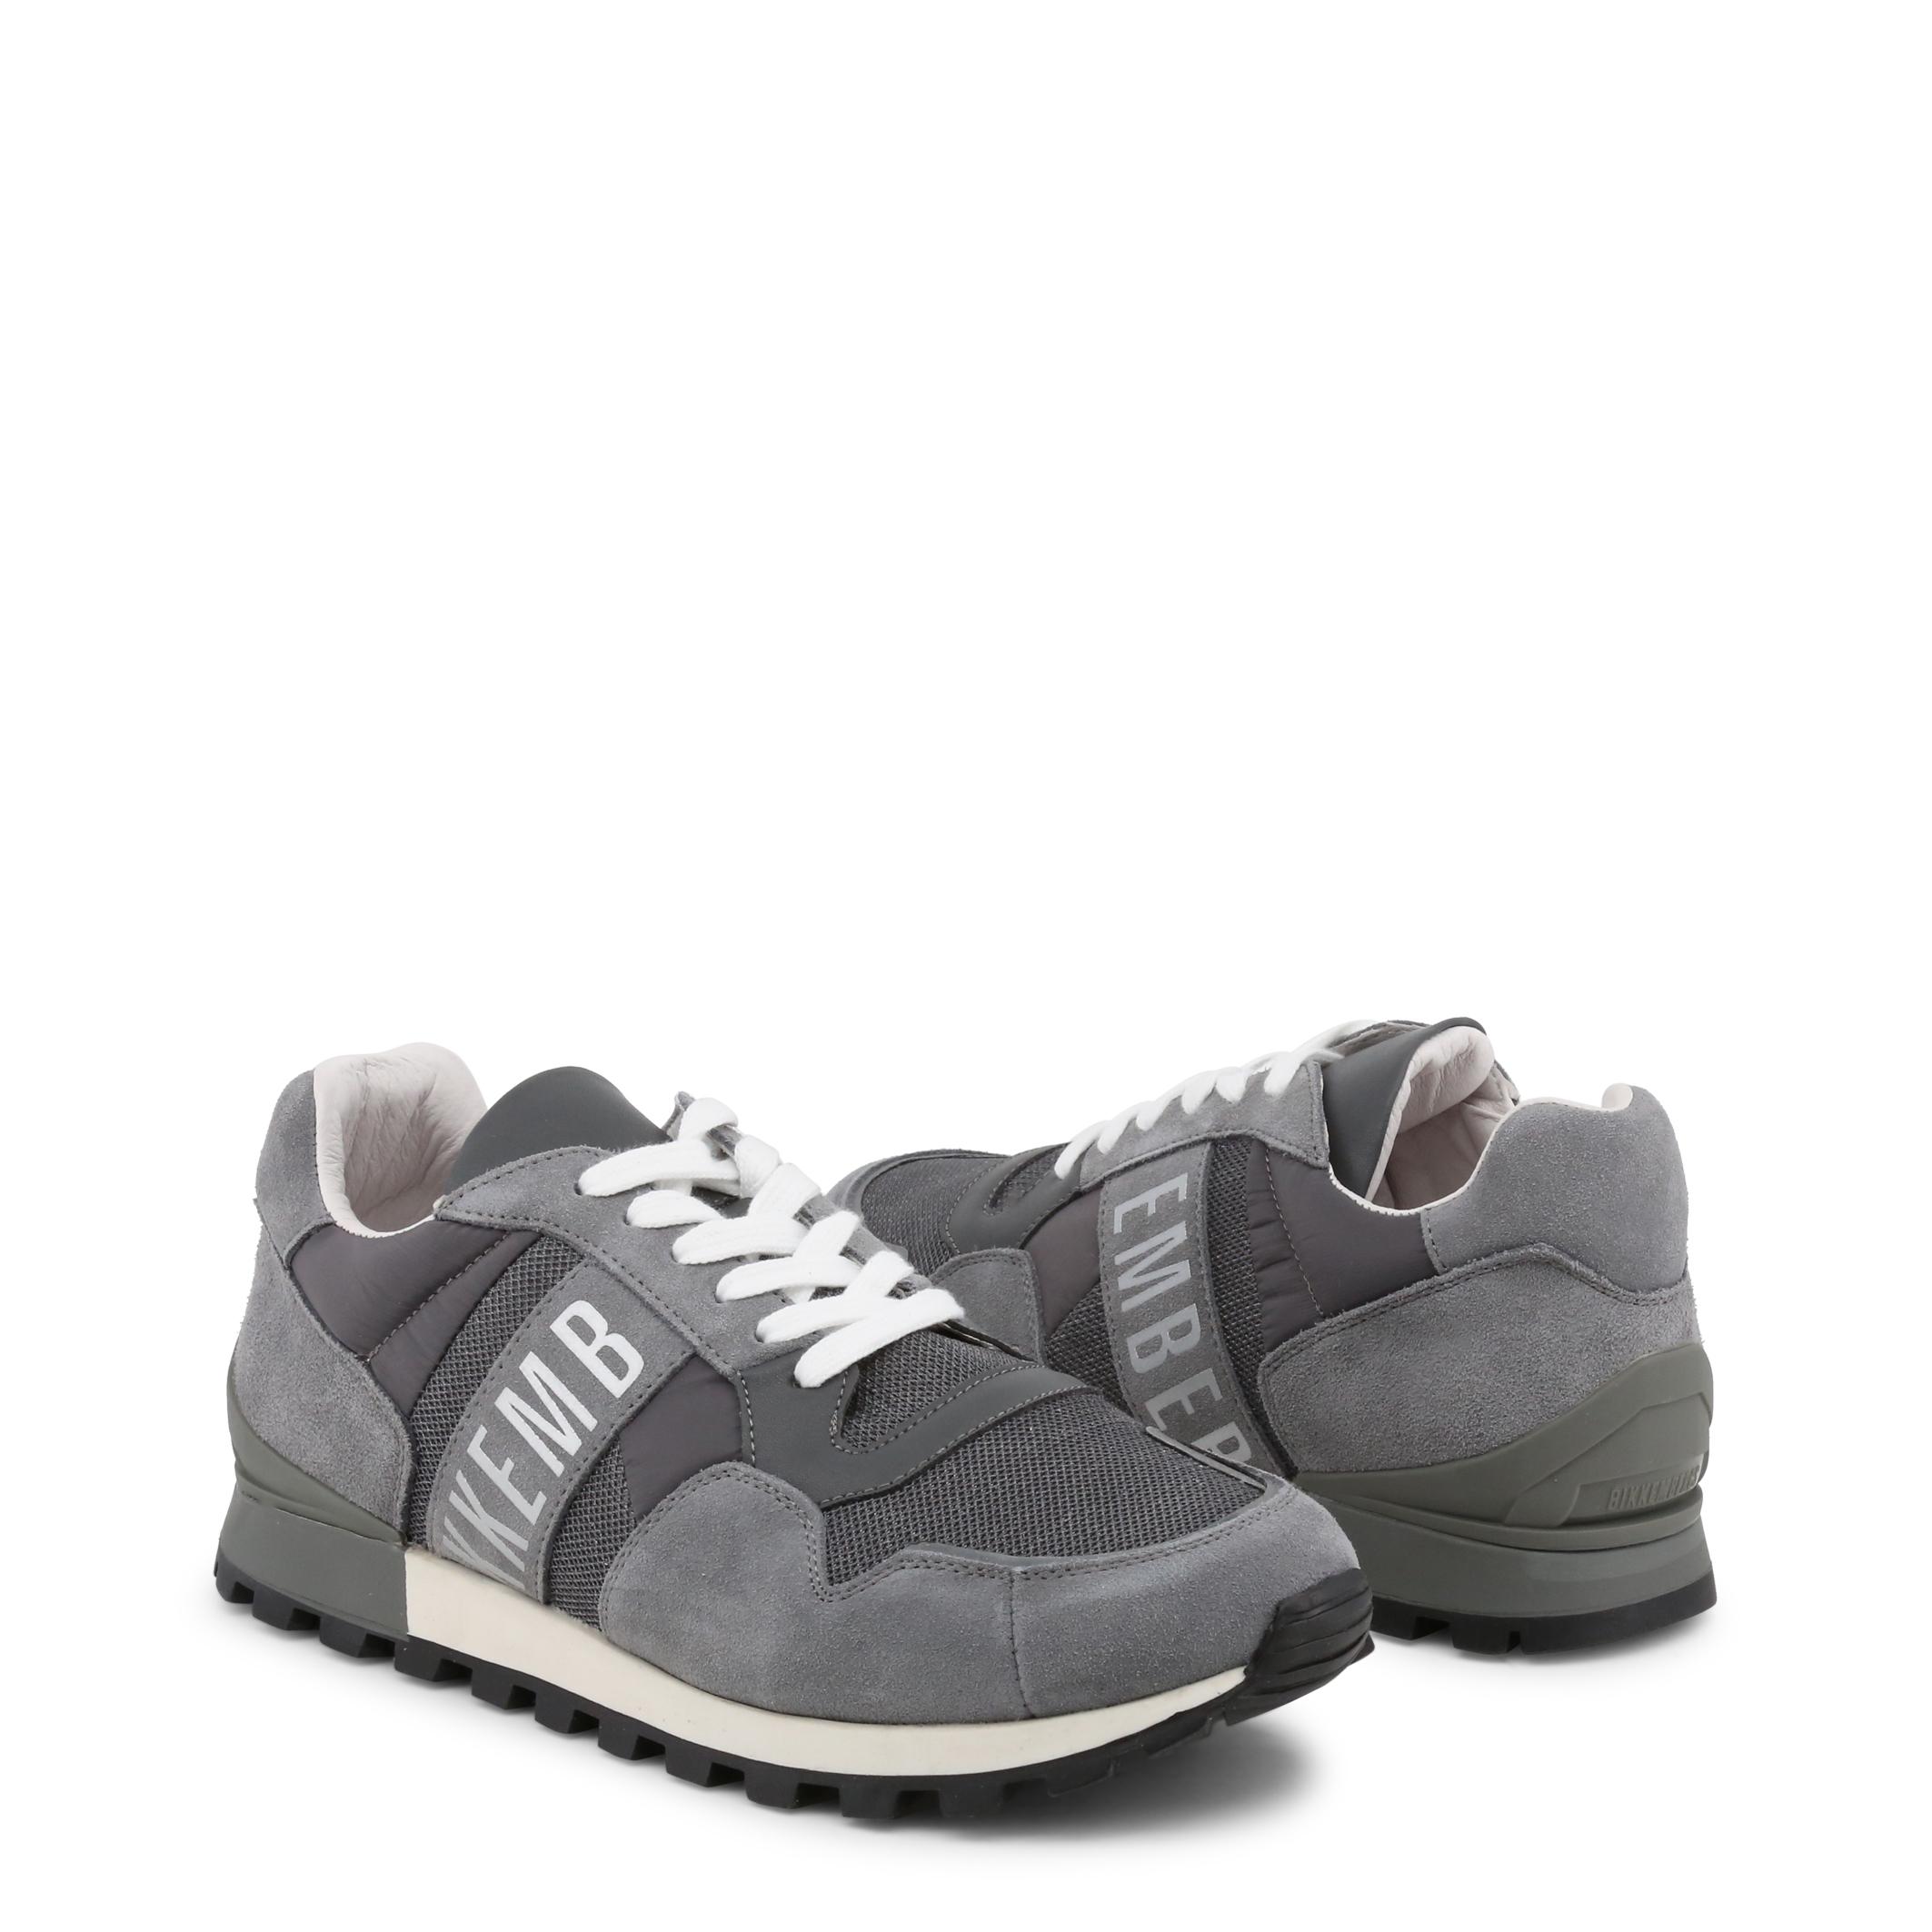 Bikkembergs FEND-ER/_2376 Men Sneakers Grey